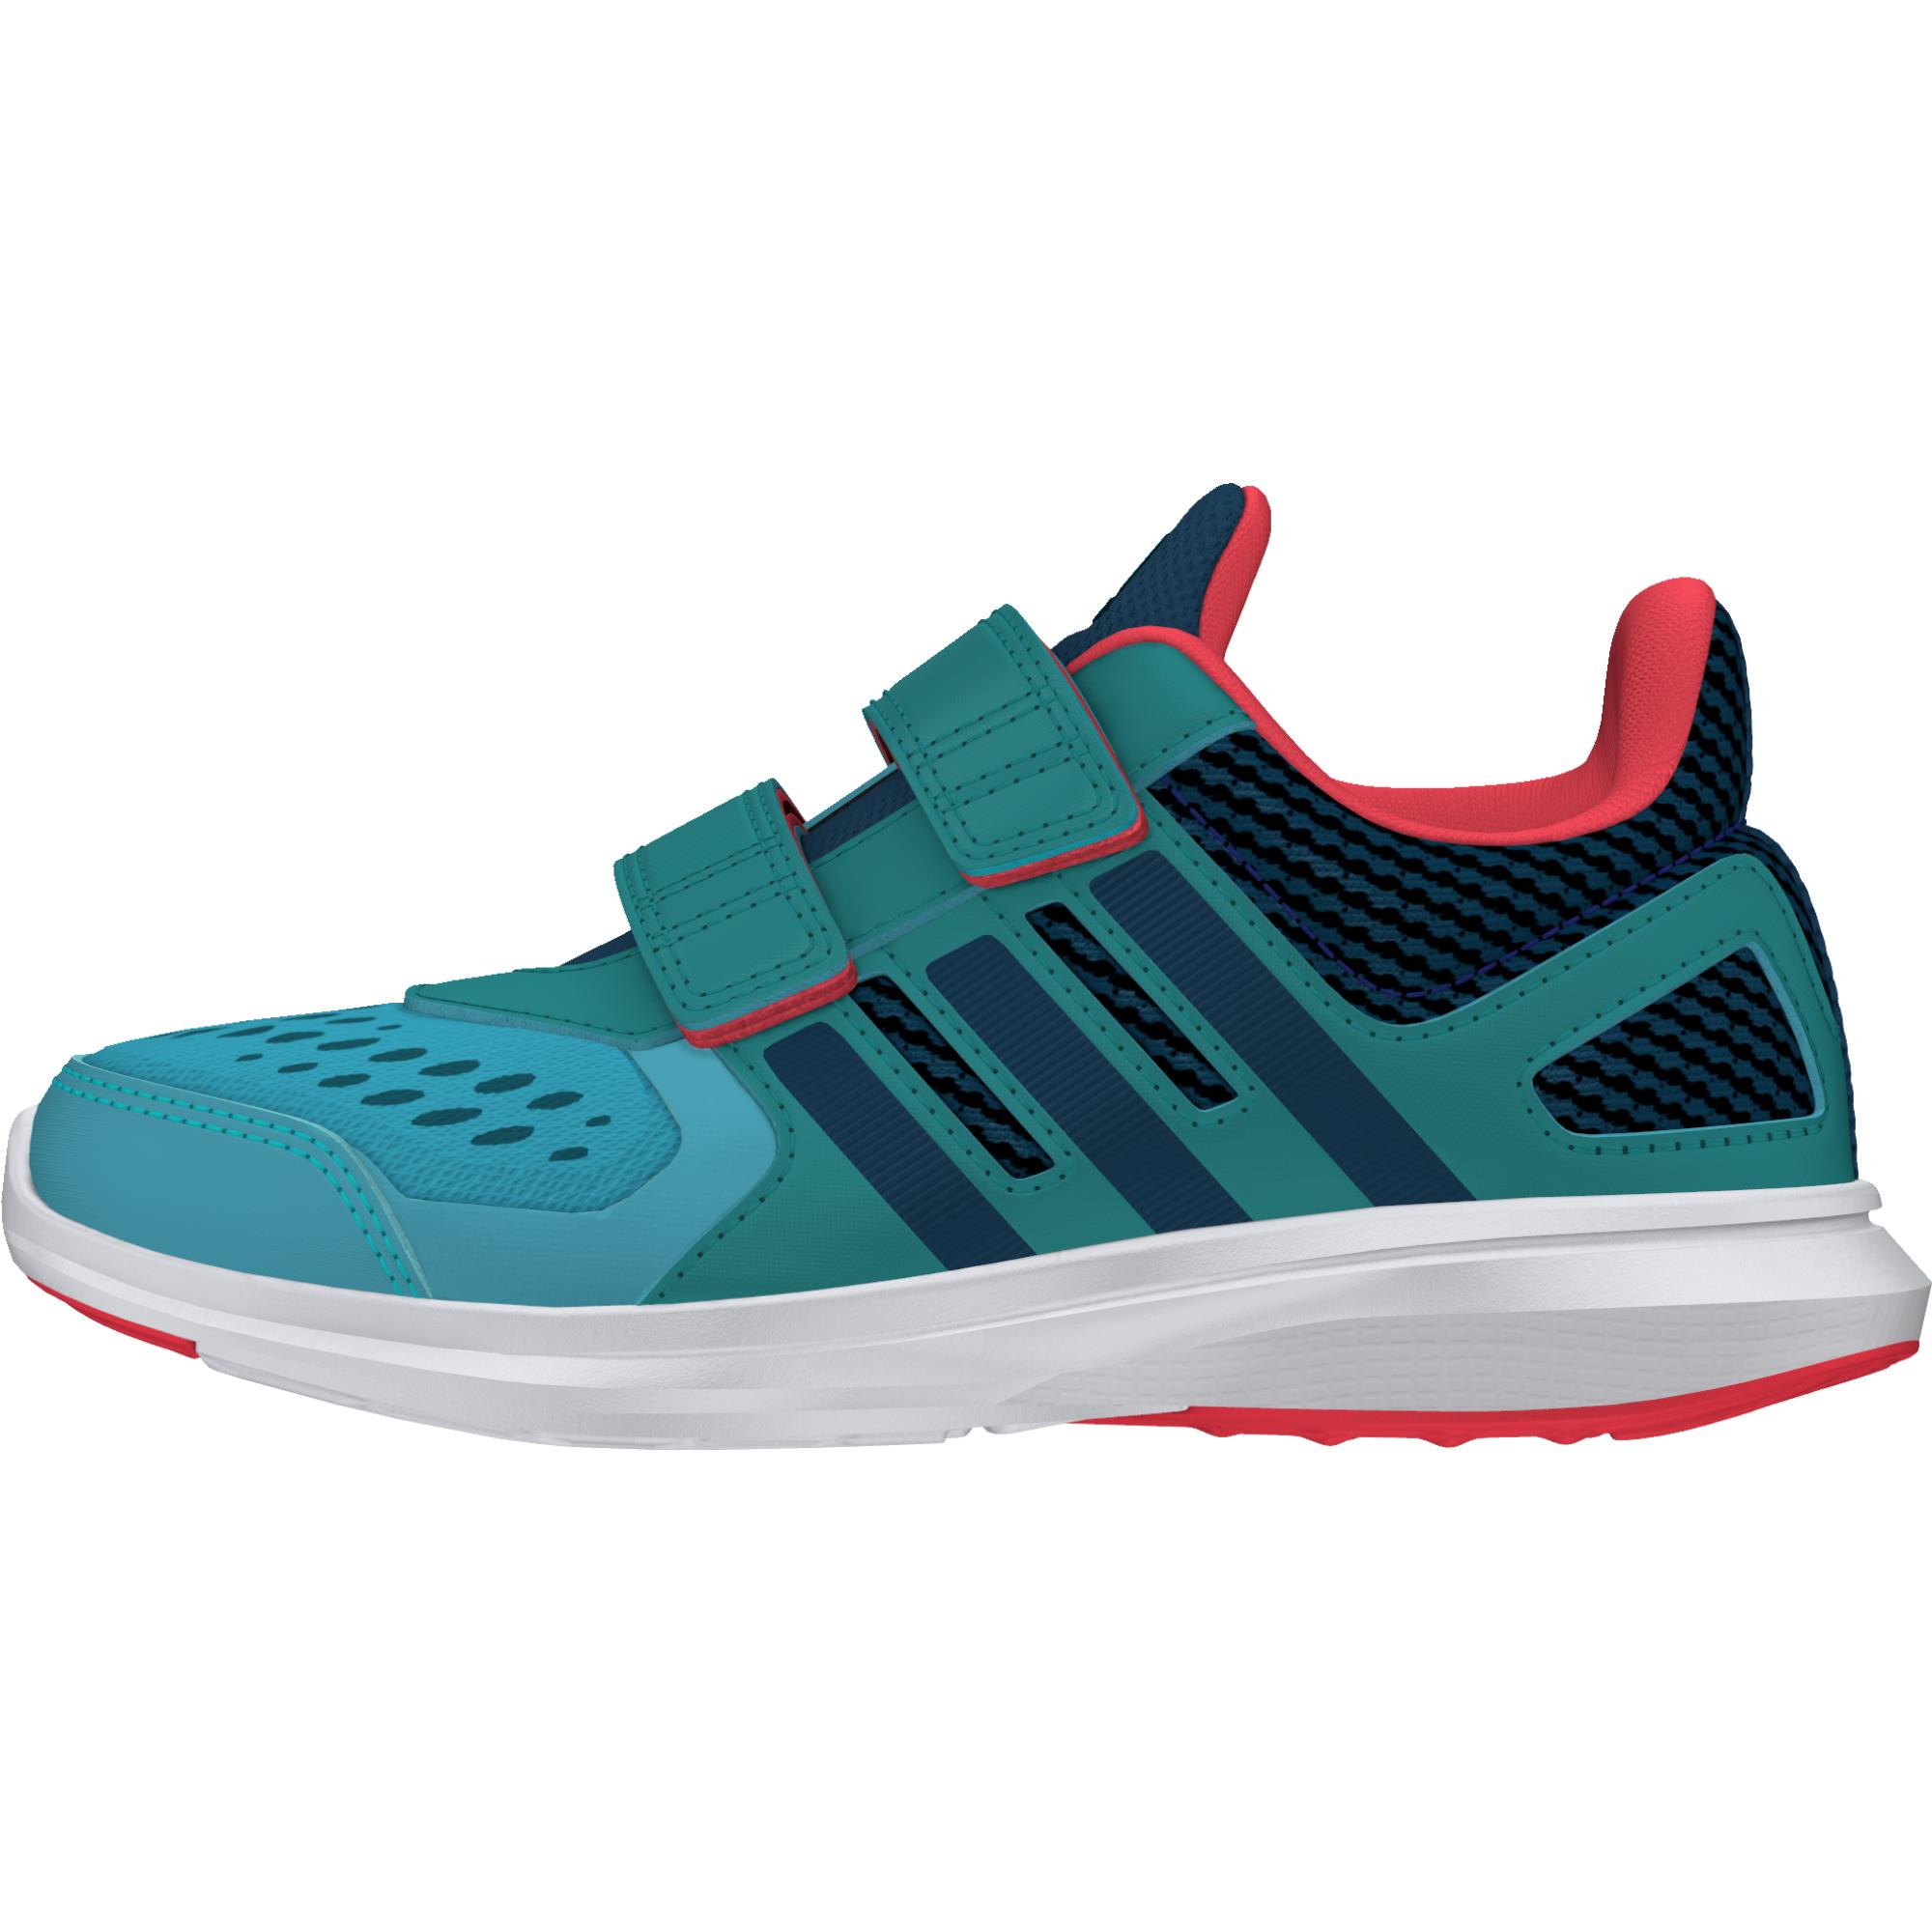 Adidas Chlapčenské bežecké tenisky Hyperfast - zeleno-modré f91e65a82c5